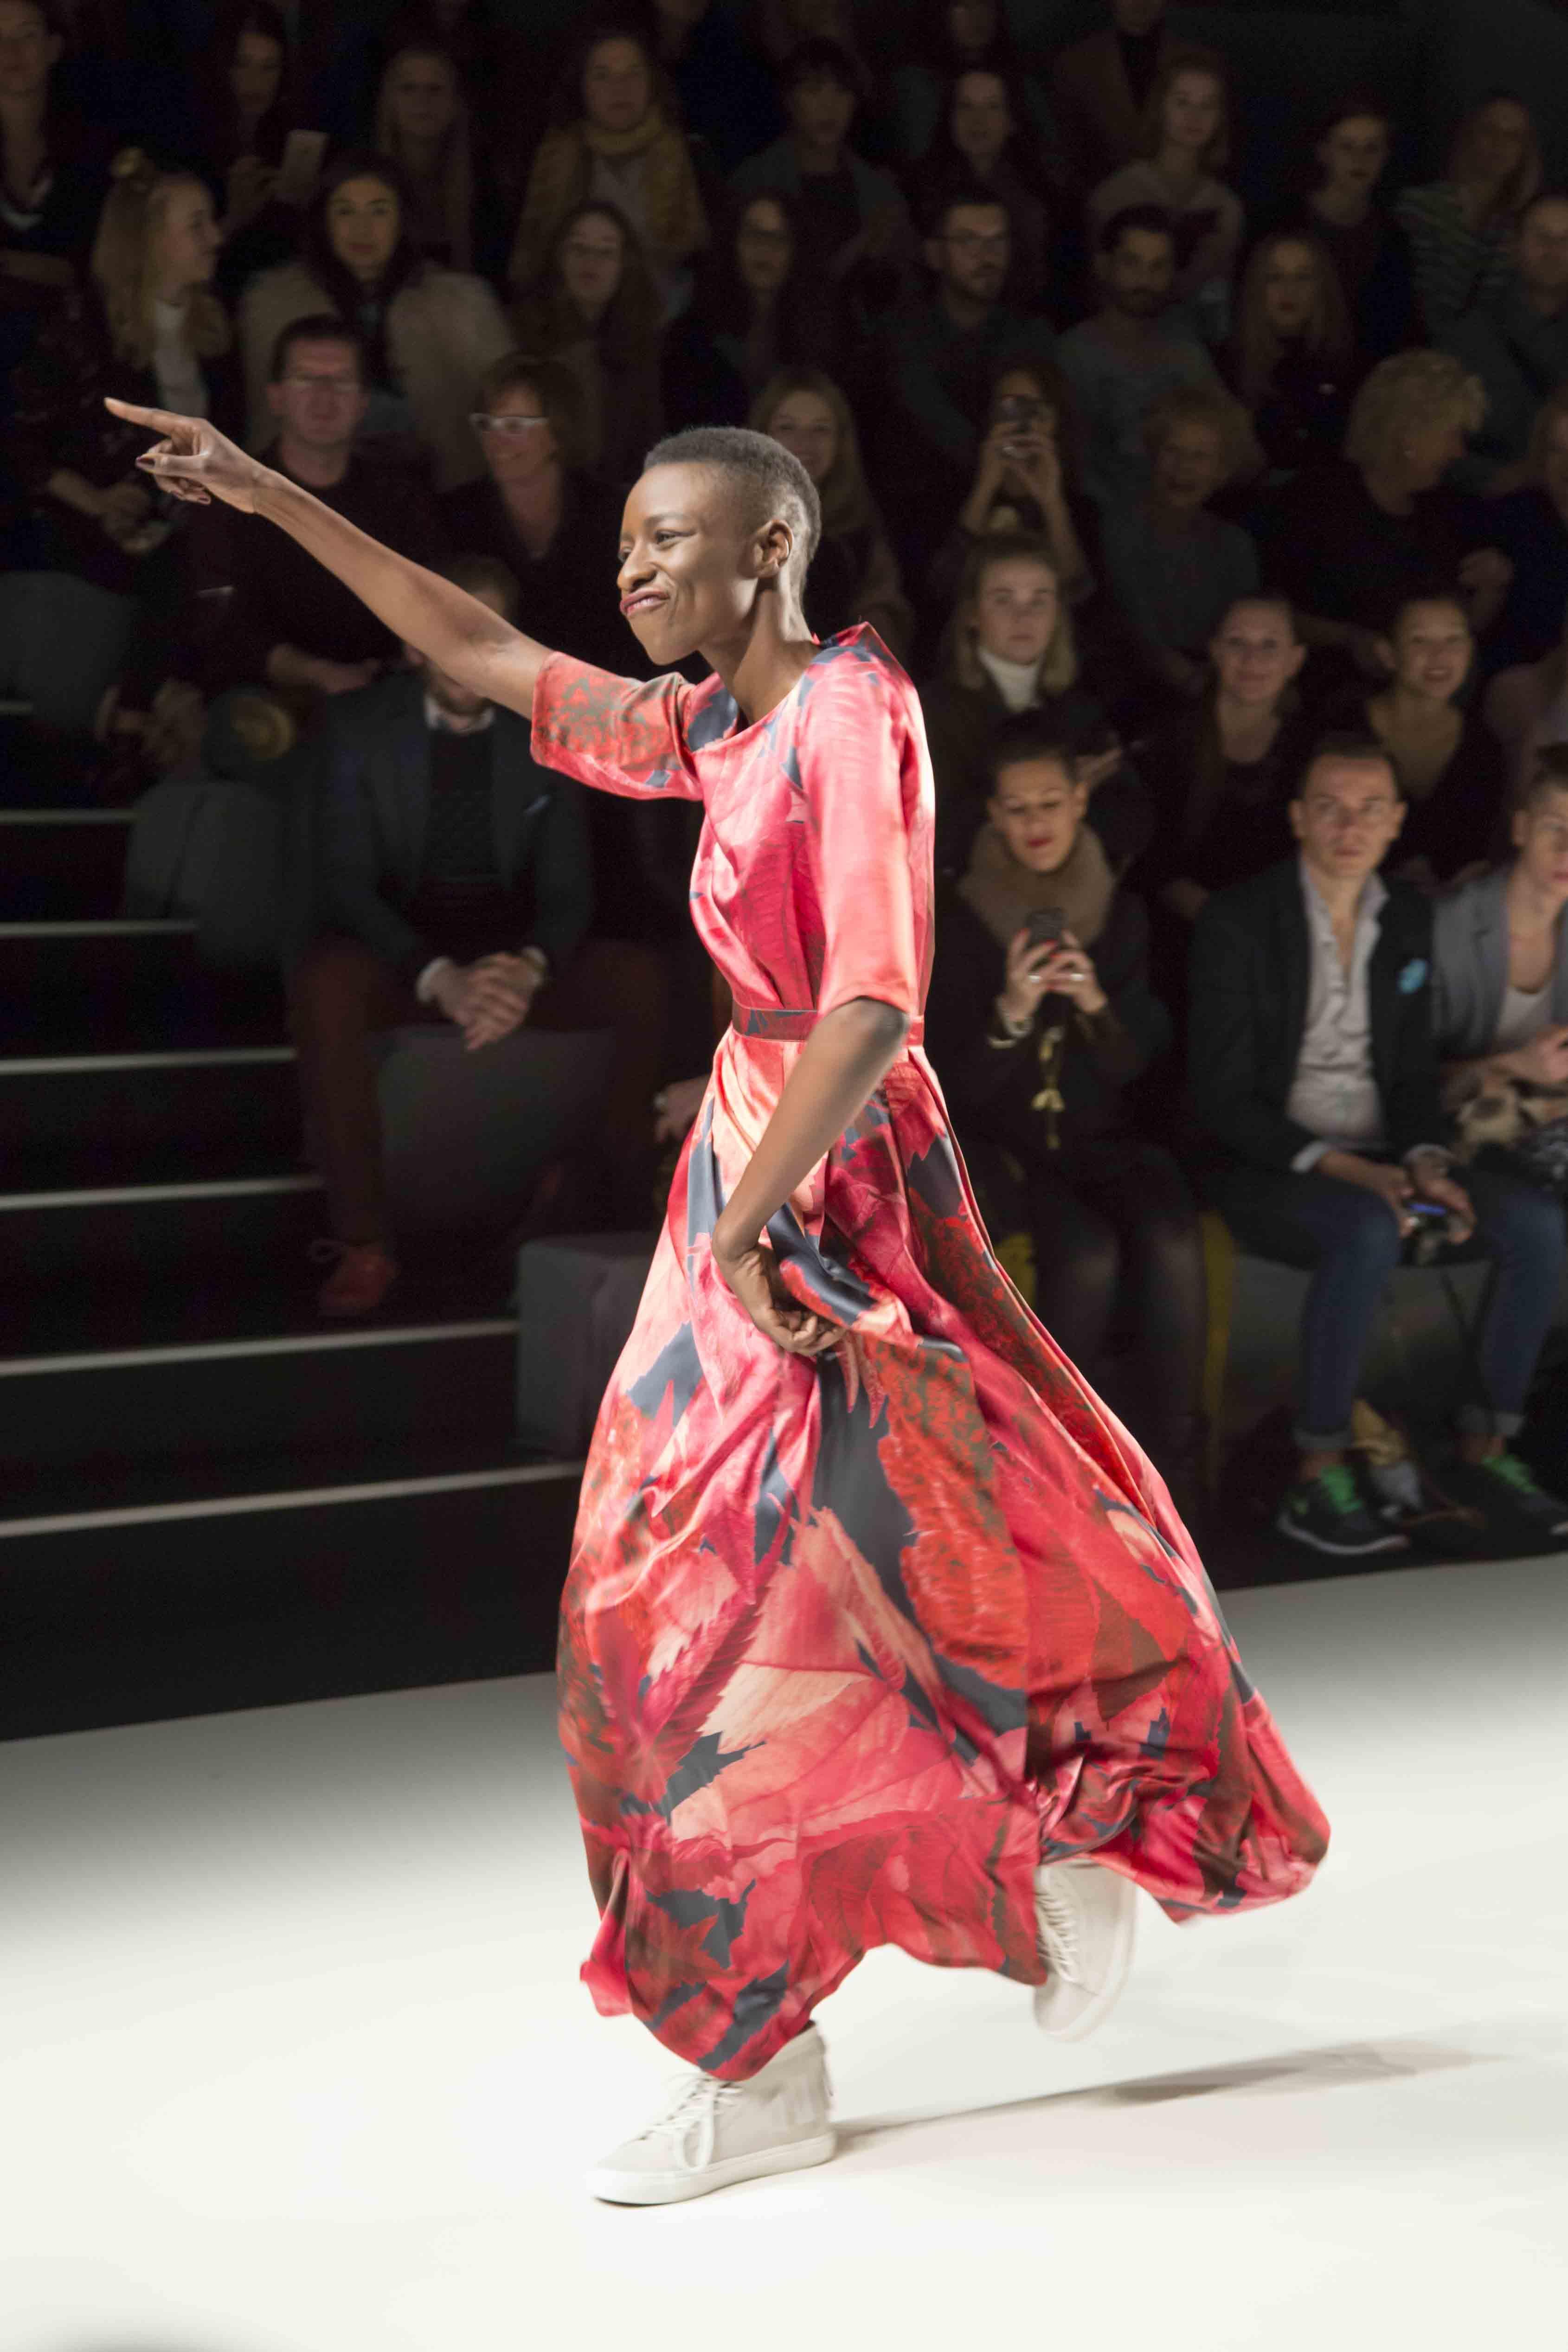 fashion week berlin - maria brussig - zalando lounge - 22012016 - 24